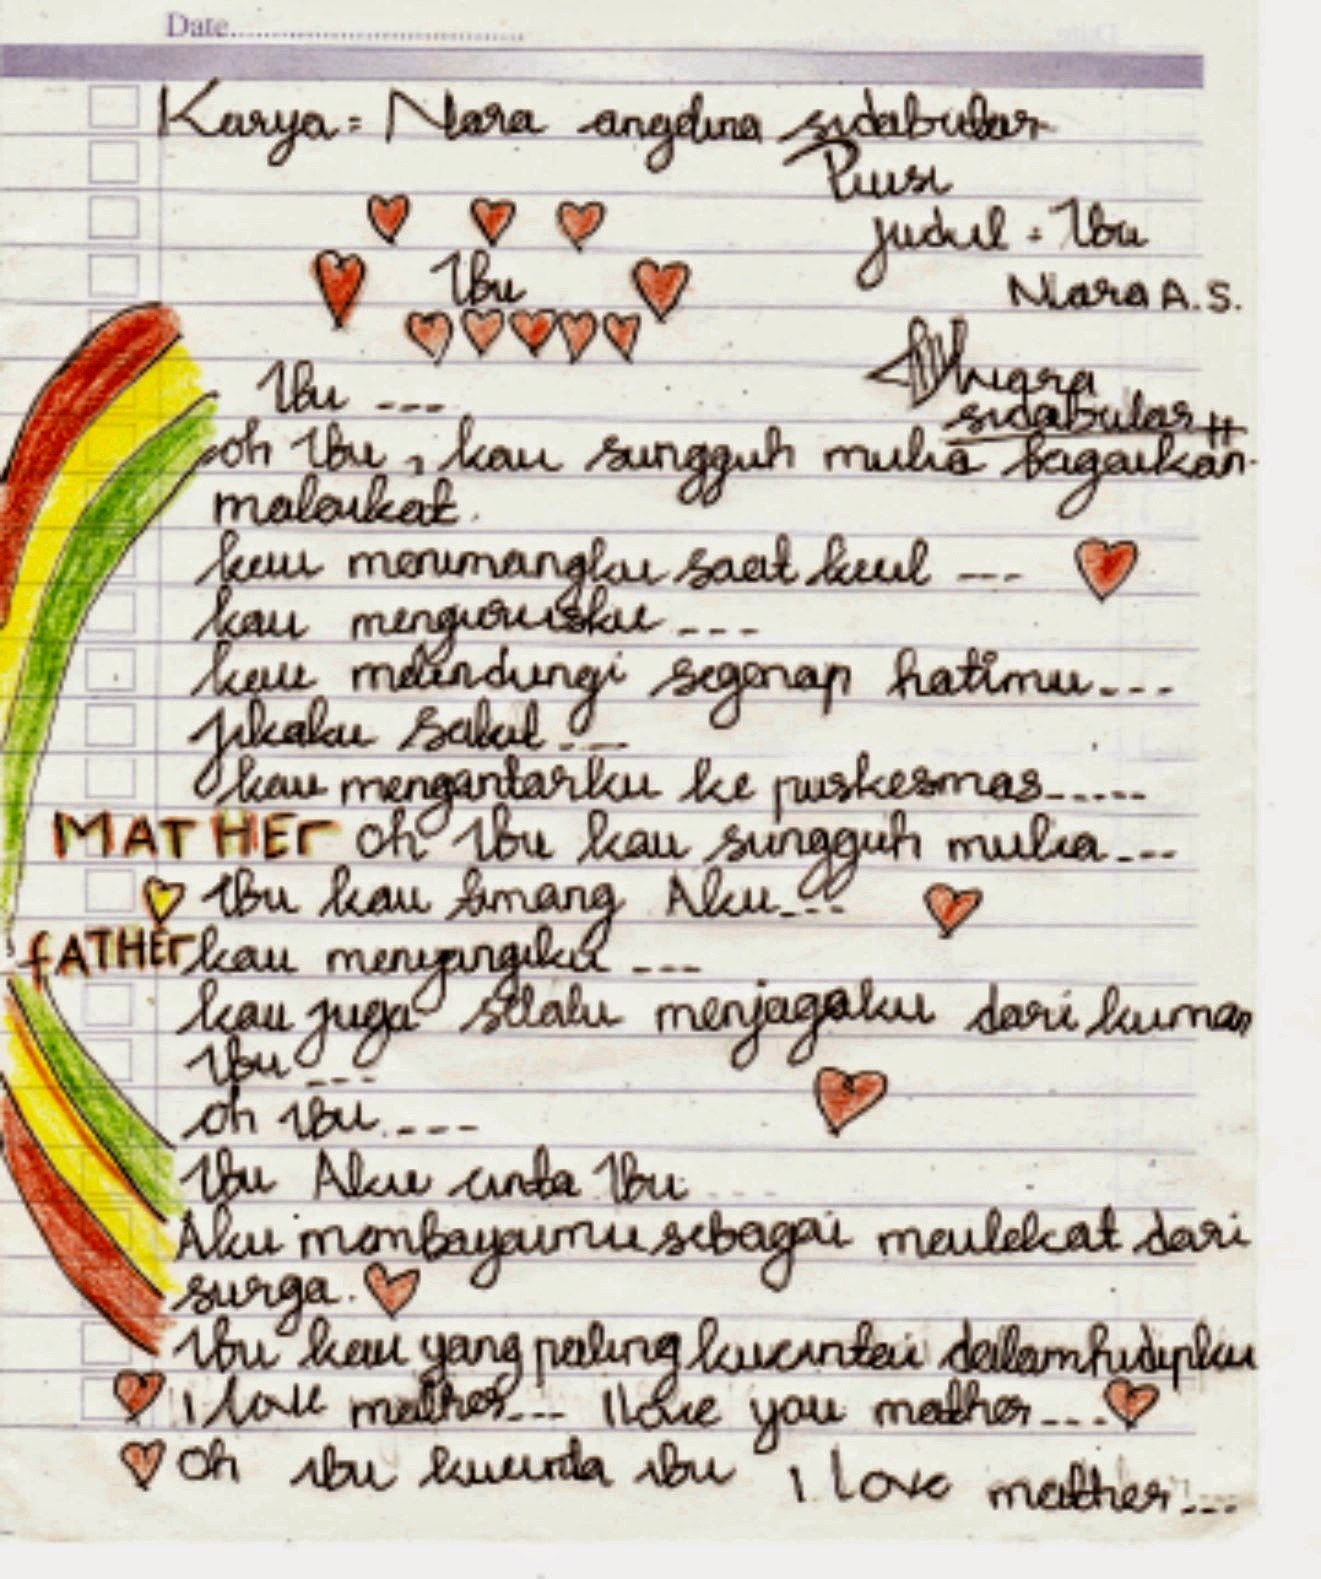 Lampiran Puisi Cabang Lomba Fls2n Th 2015 Sma Negeri 2 Kotaagung